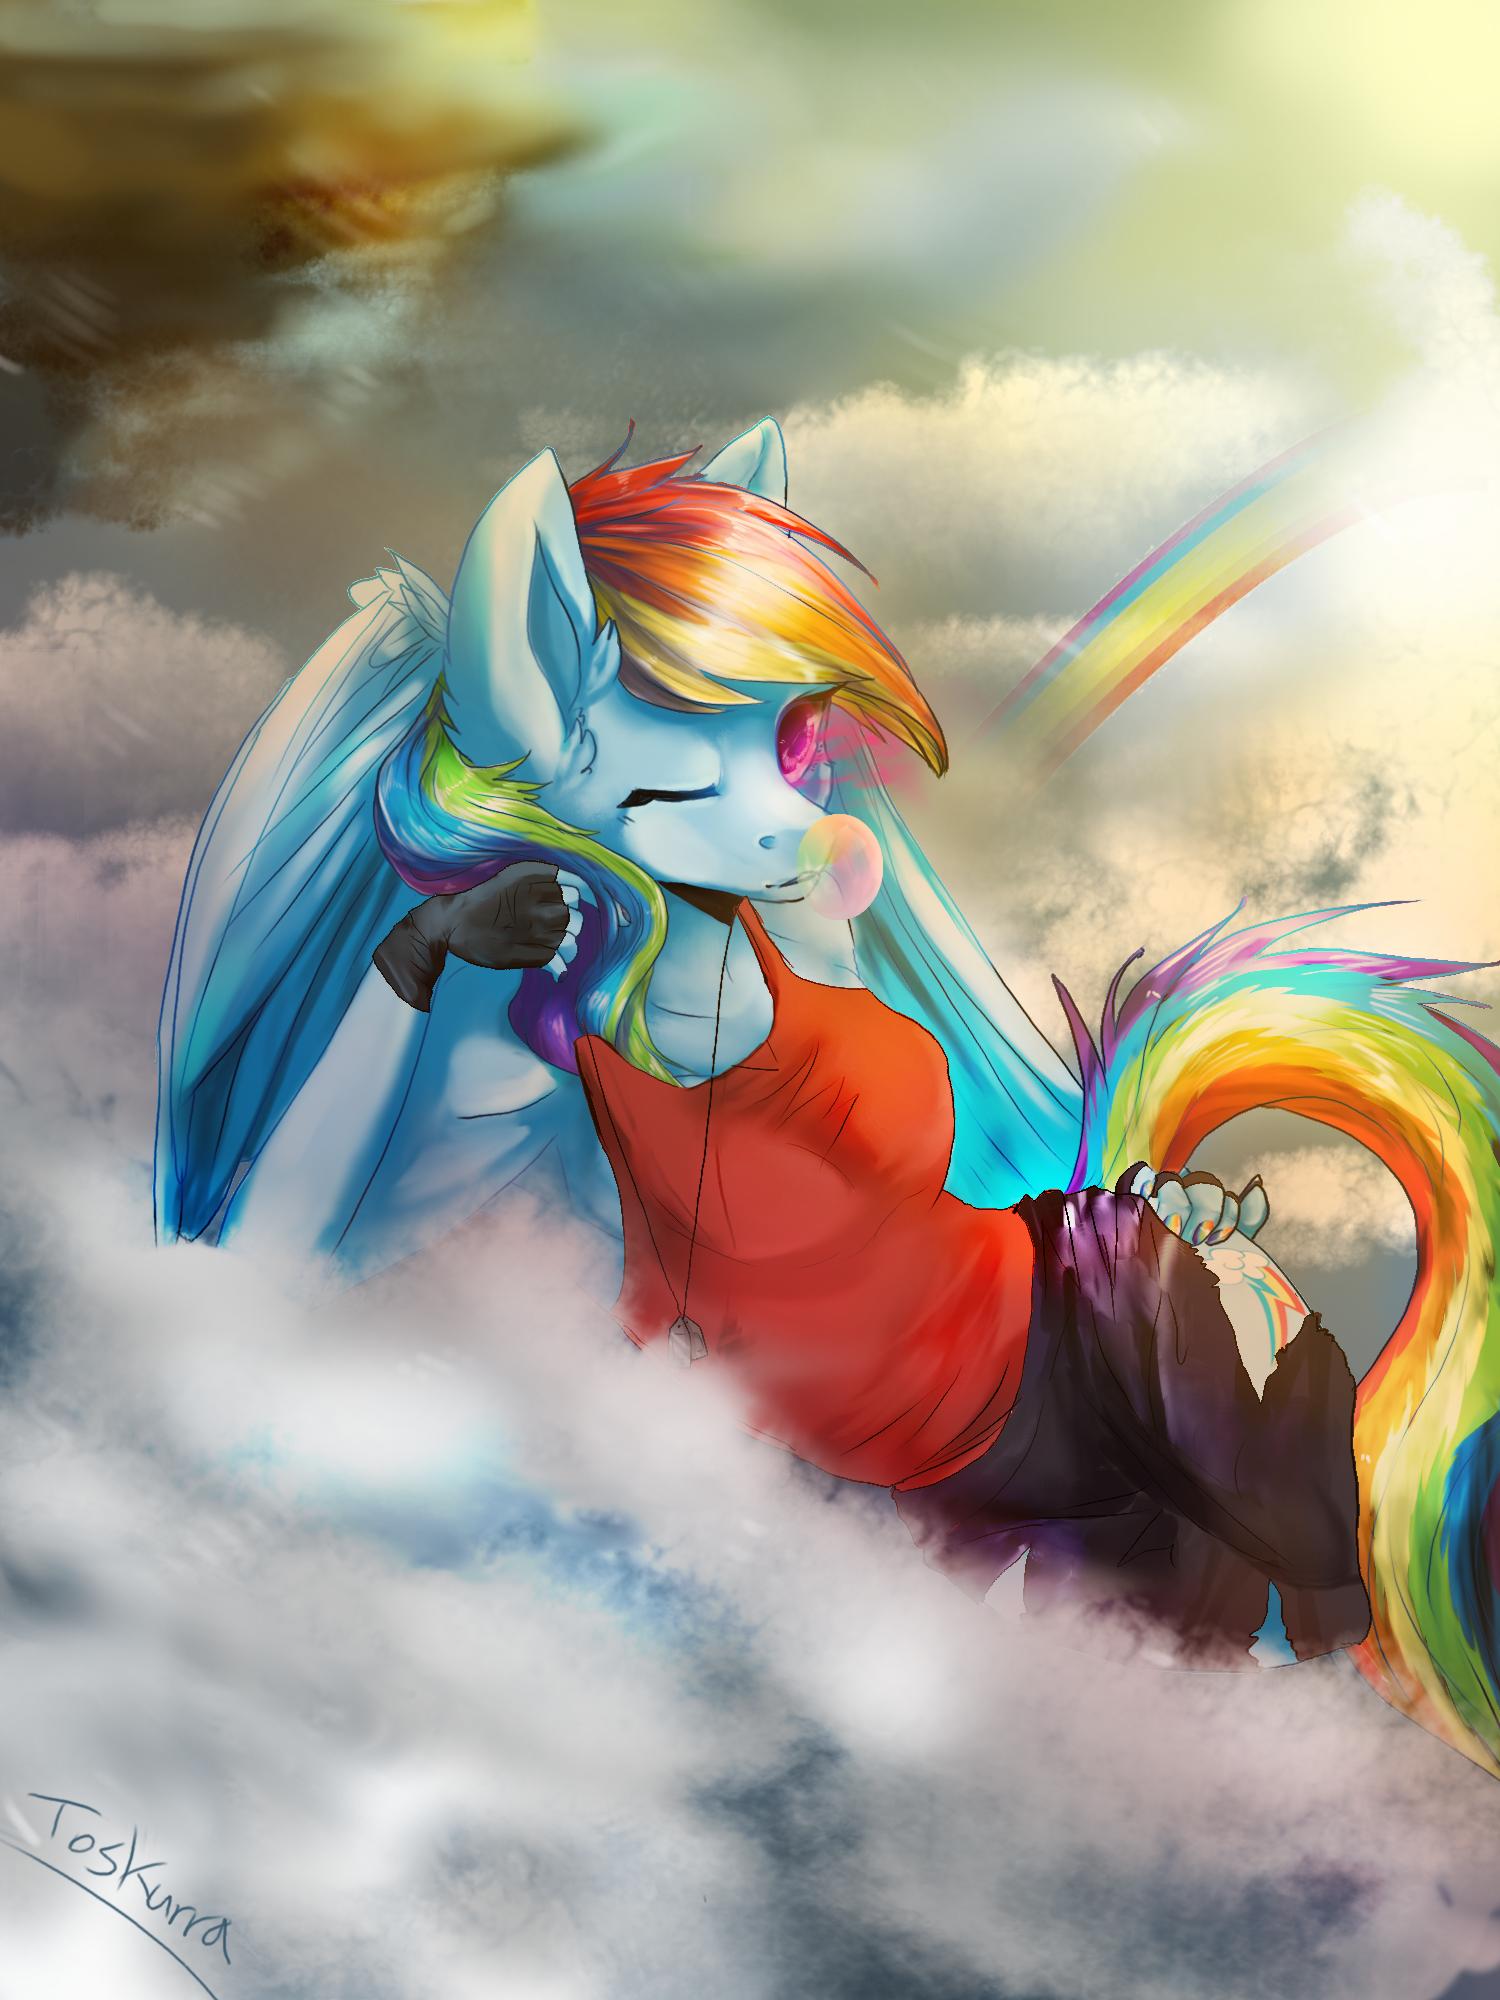 Mlp anthro rainbow dash - photo#39